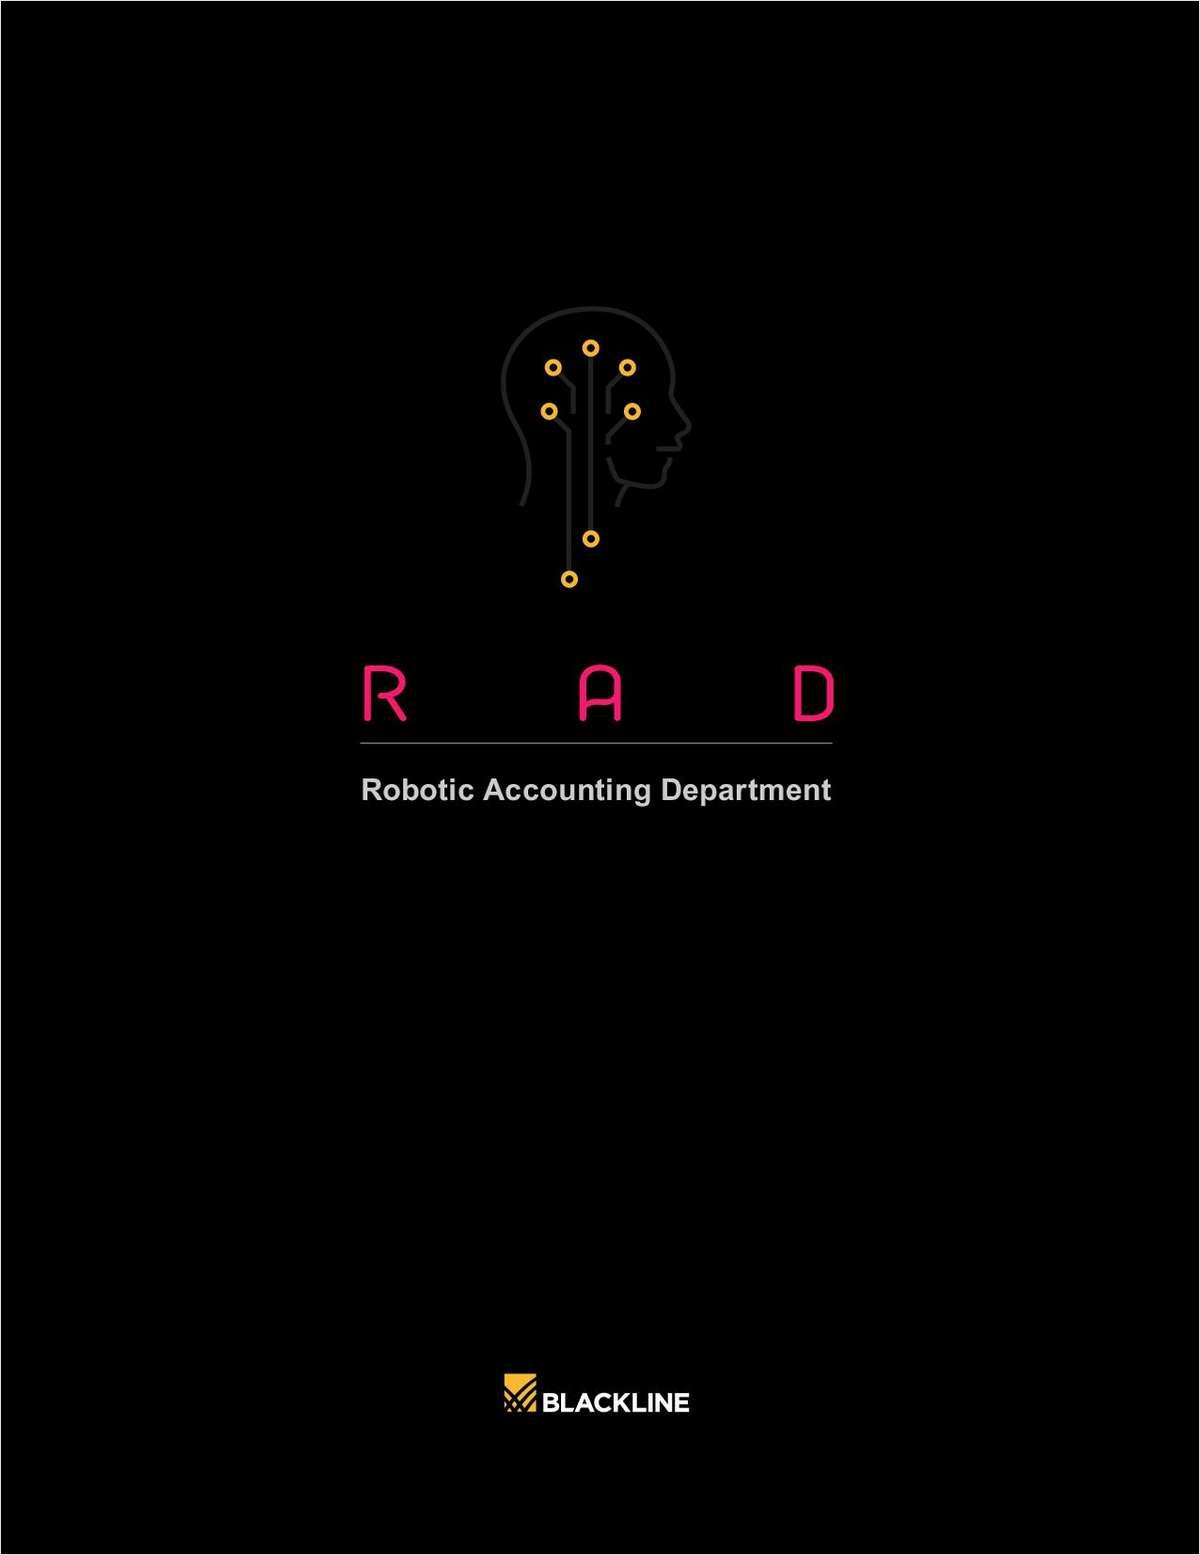 Robotic Accounting Department